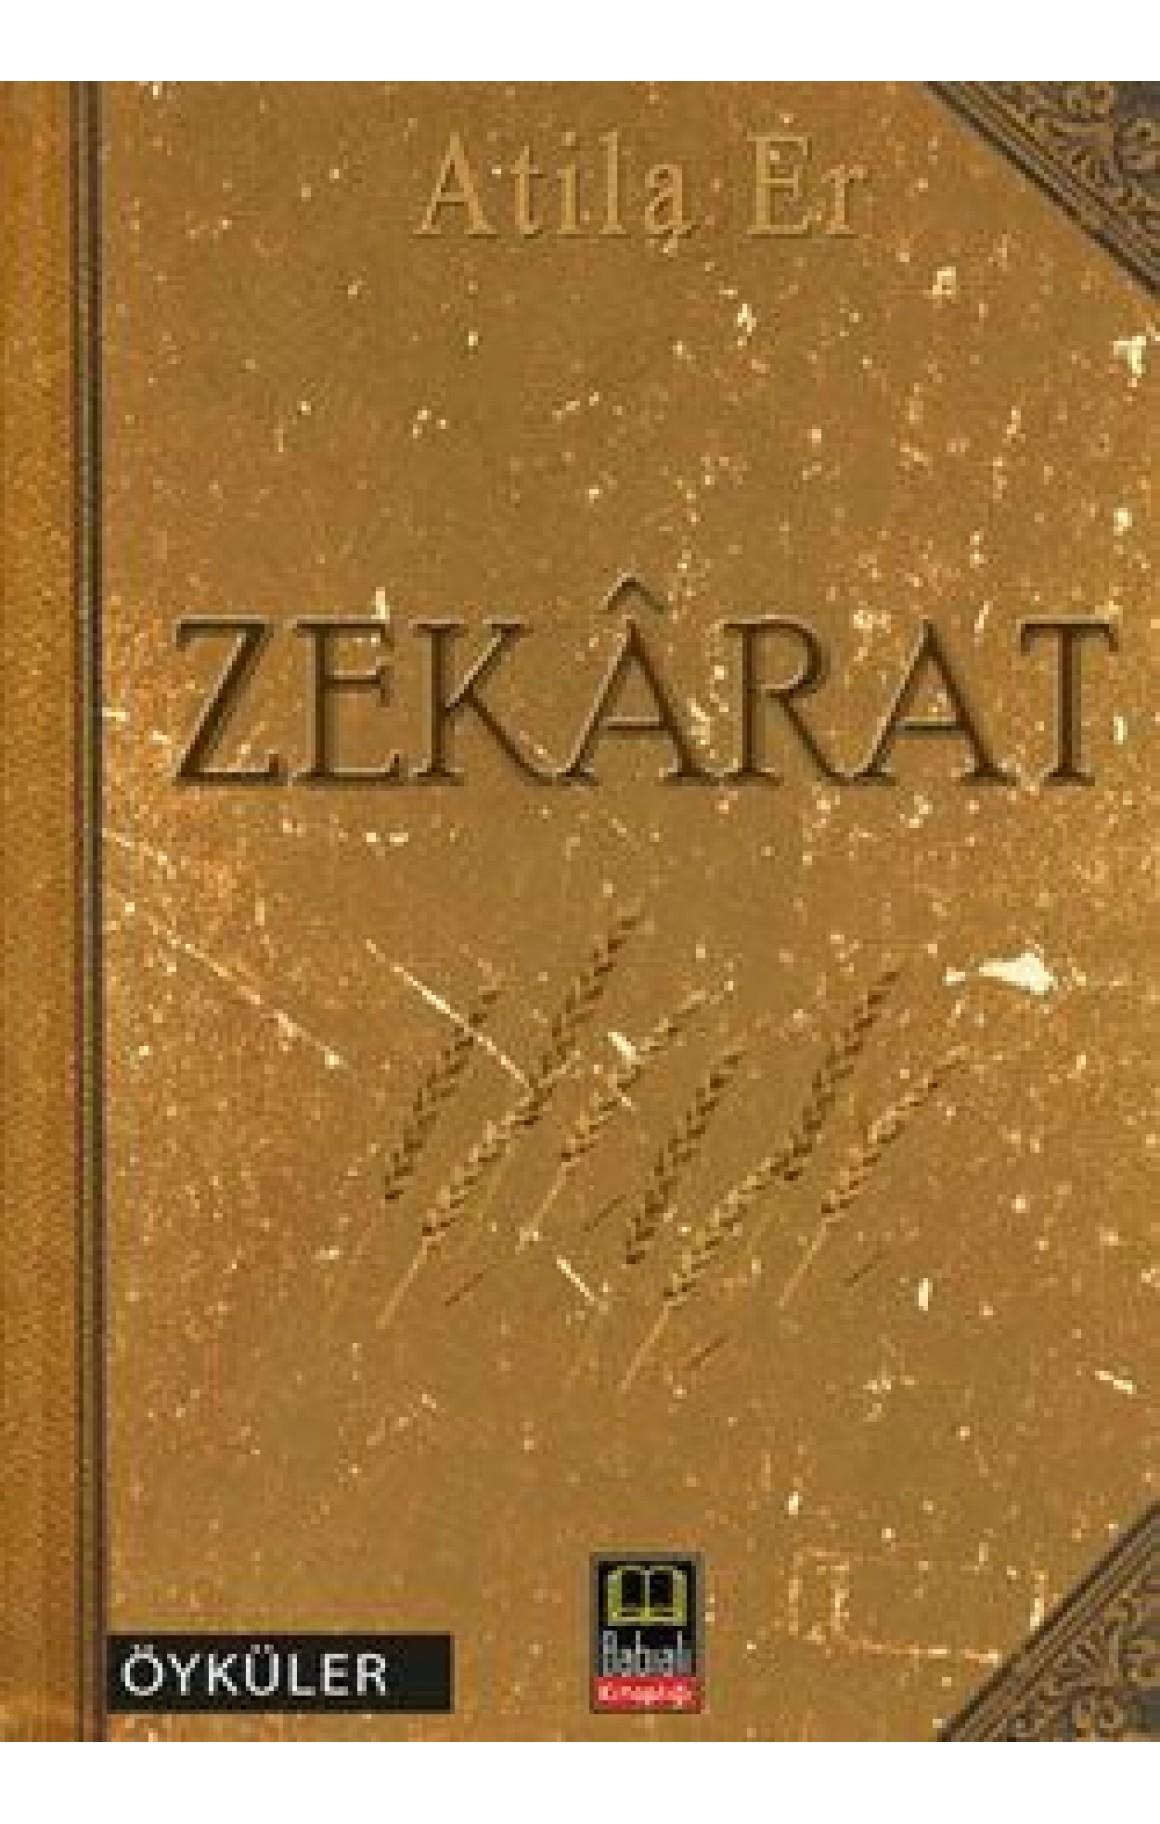 Zekarat